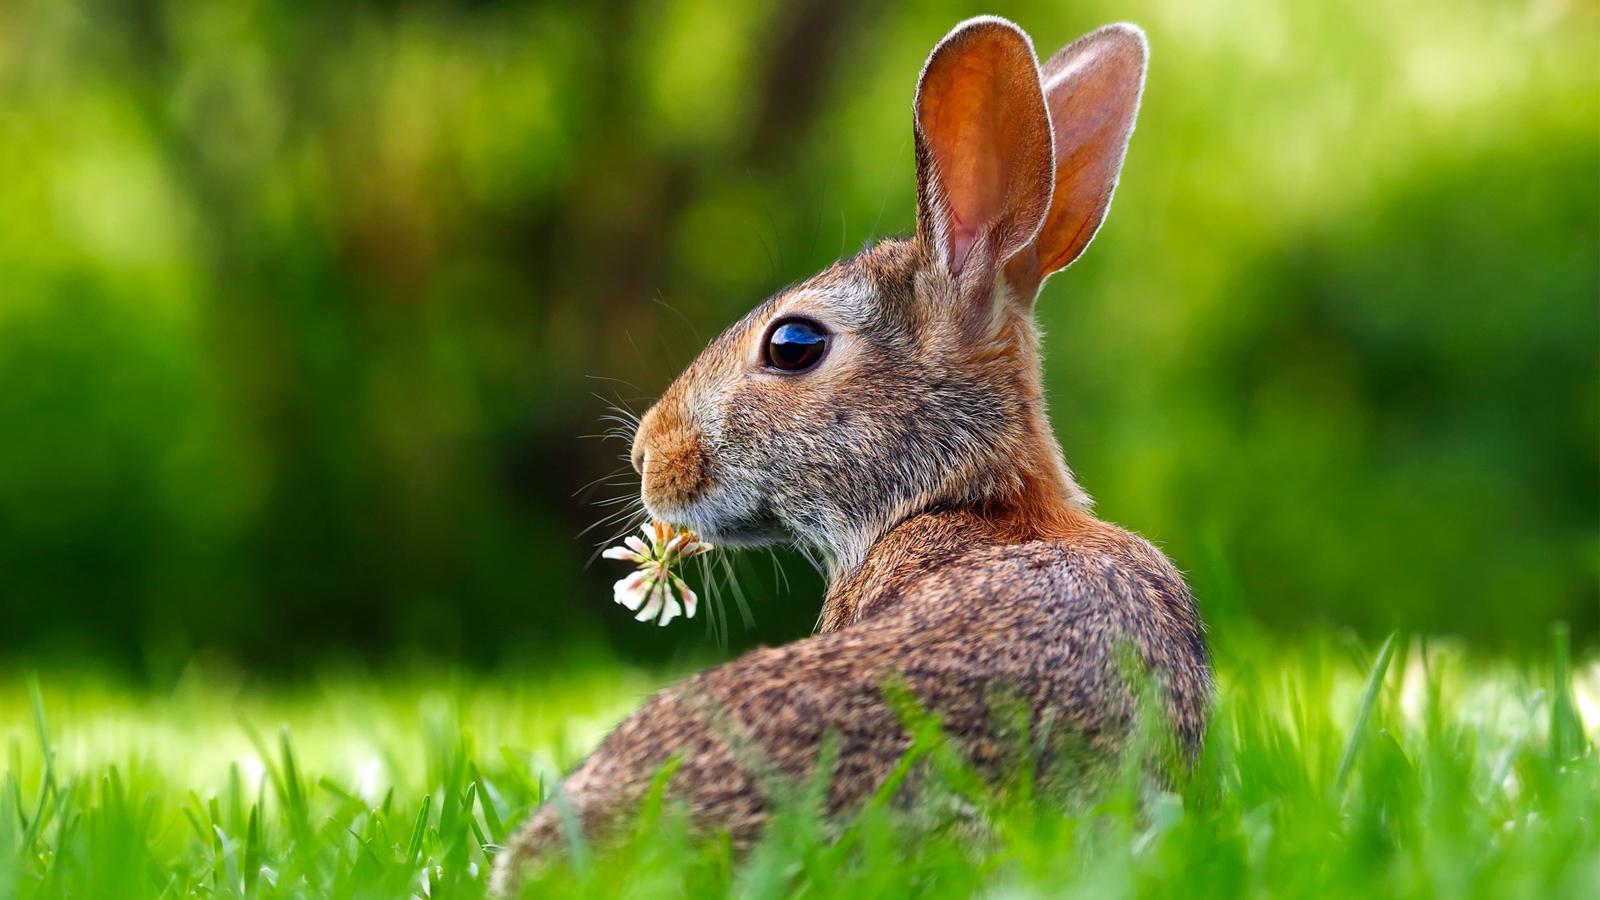 Environmentally friendly rabbit on grass